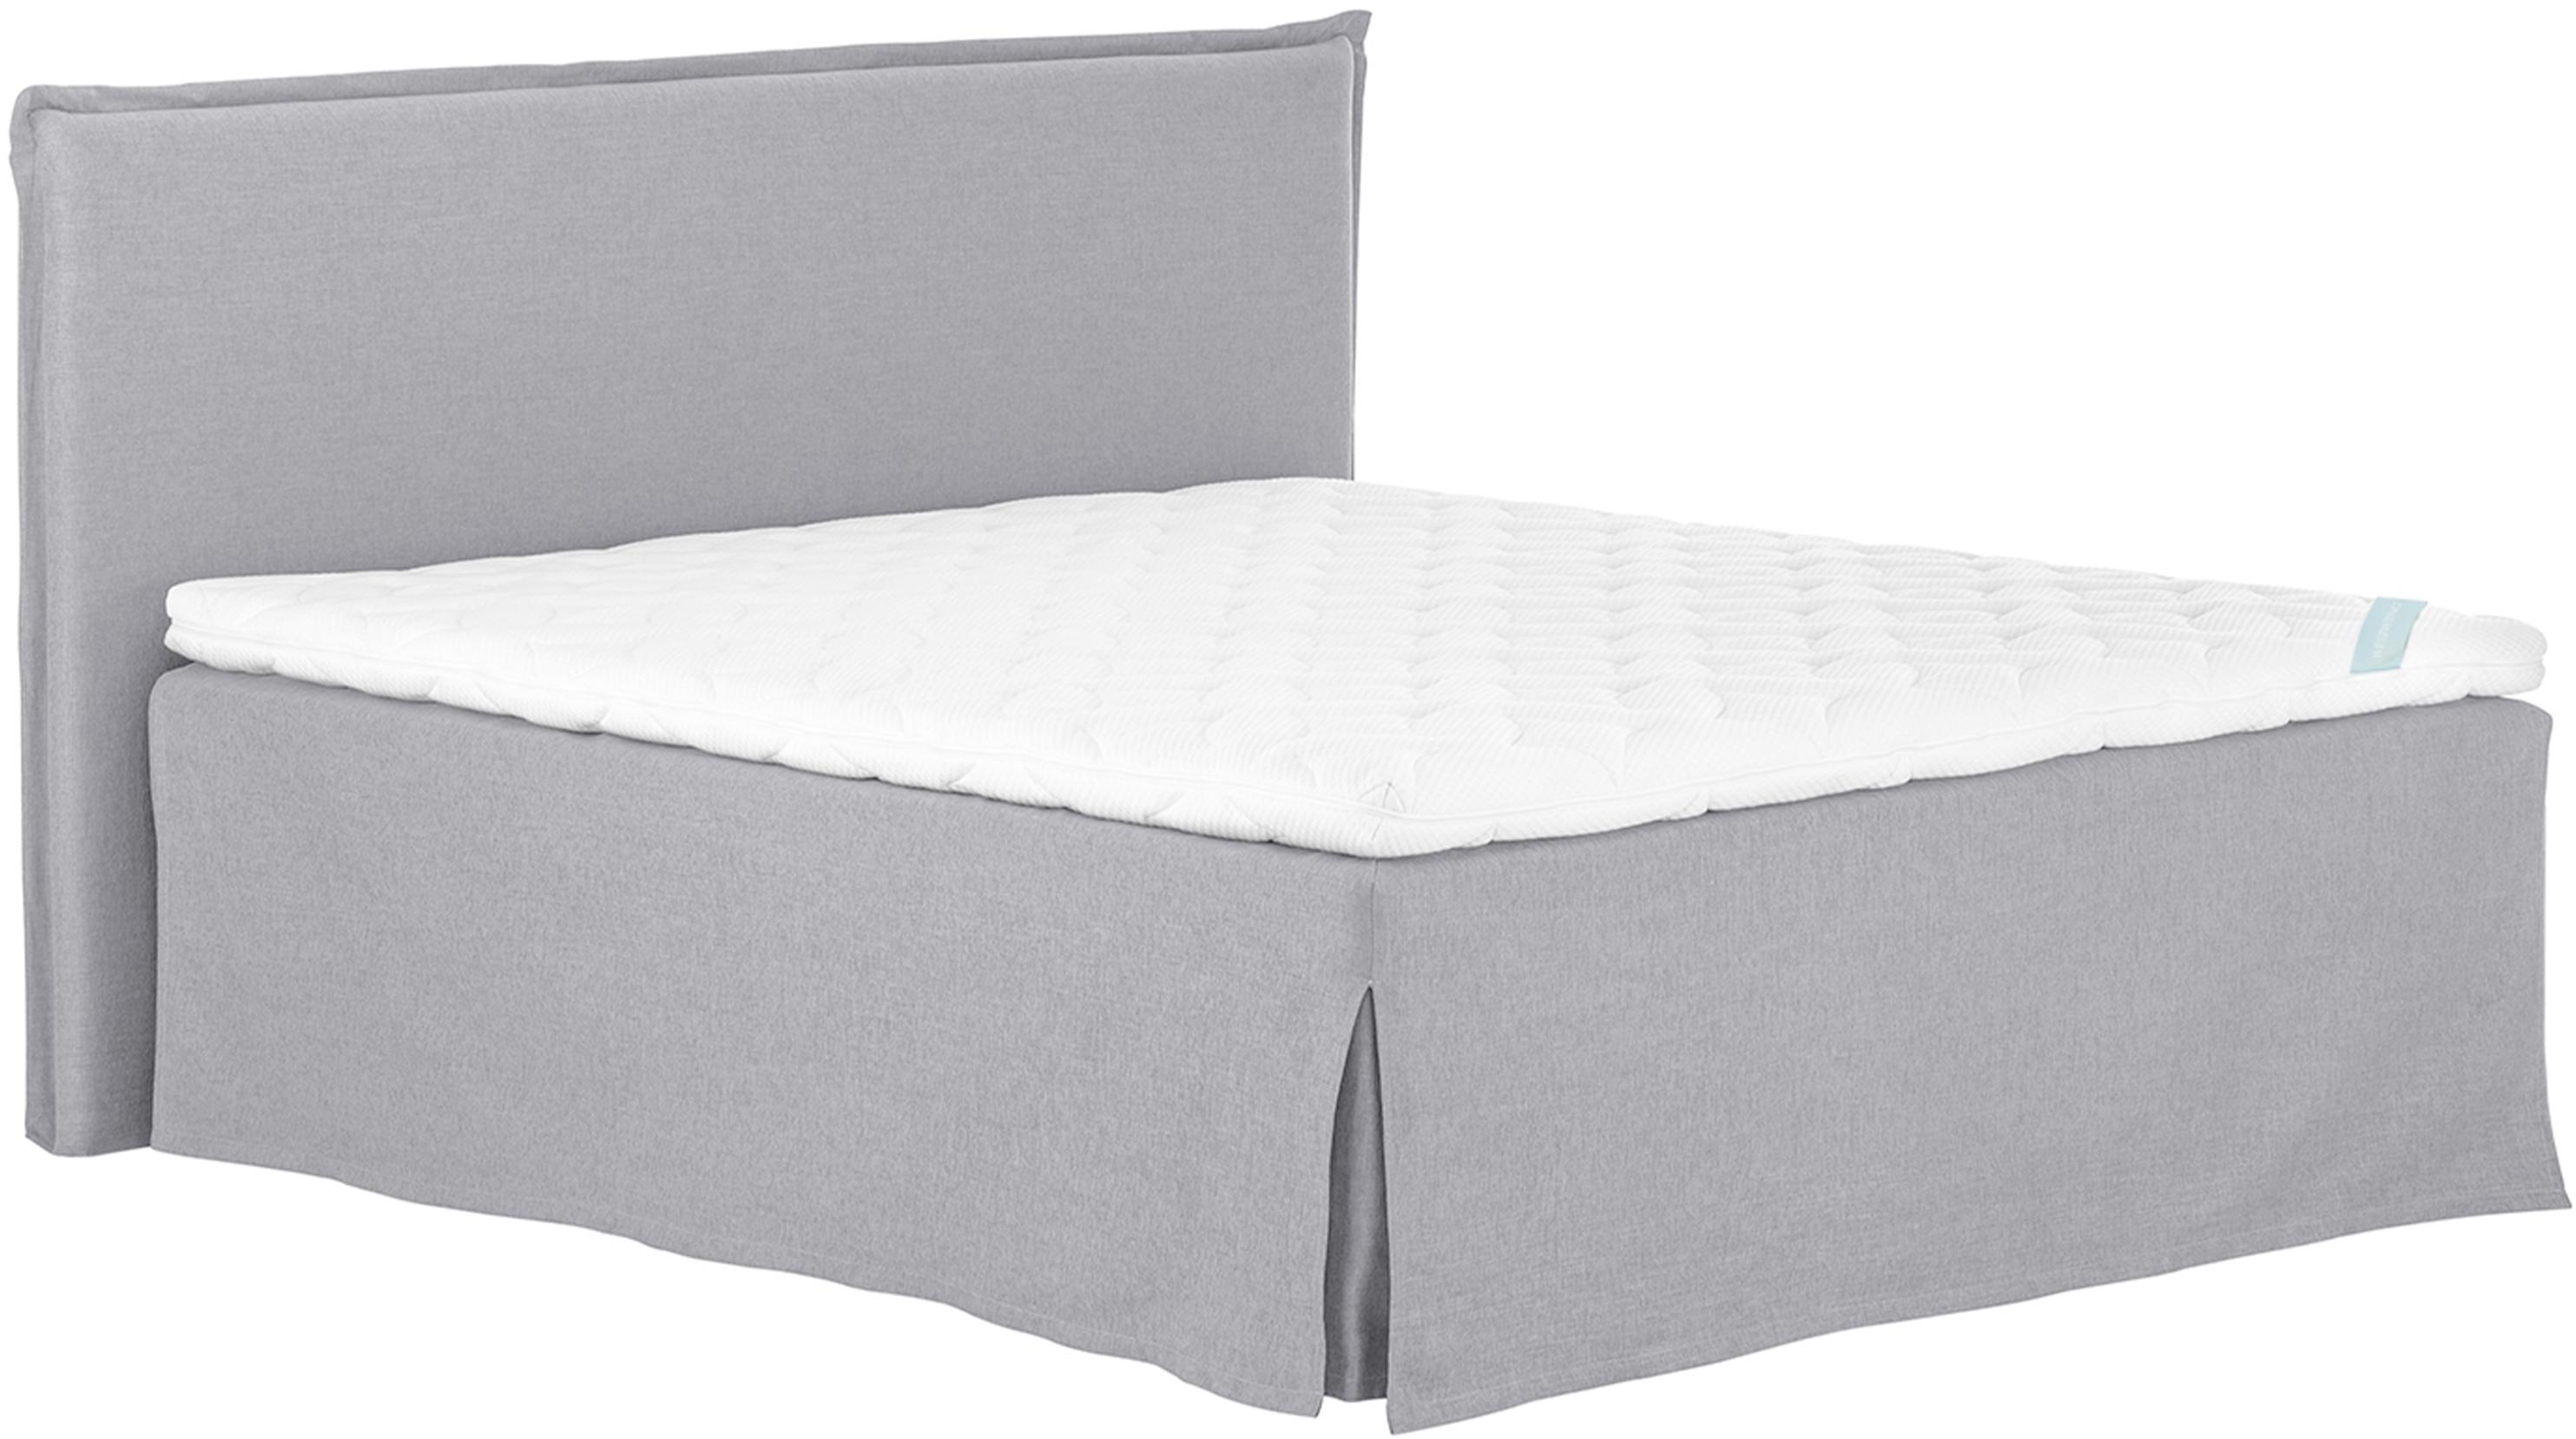 Premium boxspring bed Violet, Matras: 7-zones-pocketveringkern , Poten: gelakt massief beukenhout, Grijs, 180 x 200 cm